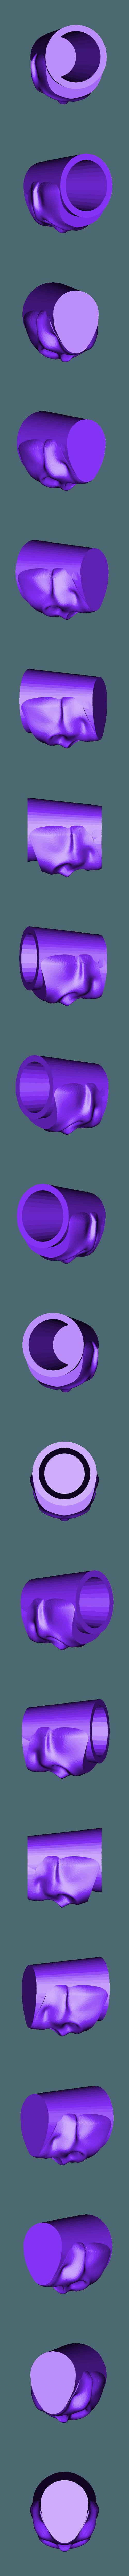 SkullShotGlassRevA.stl Download free STL file Halloween Shot Glass • 3D printer template, ThinkSolutions